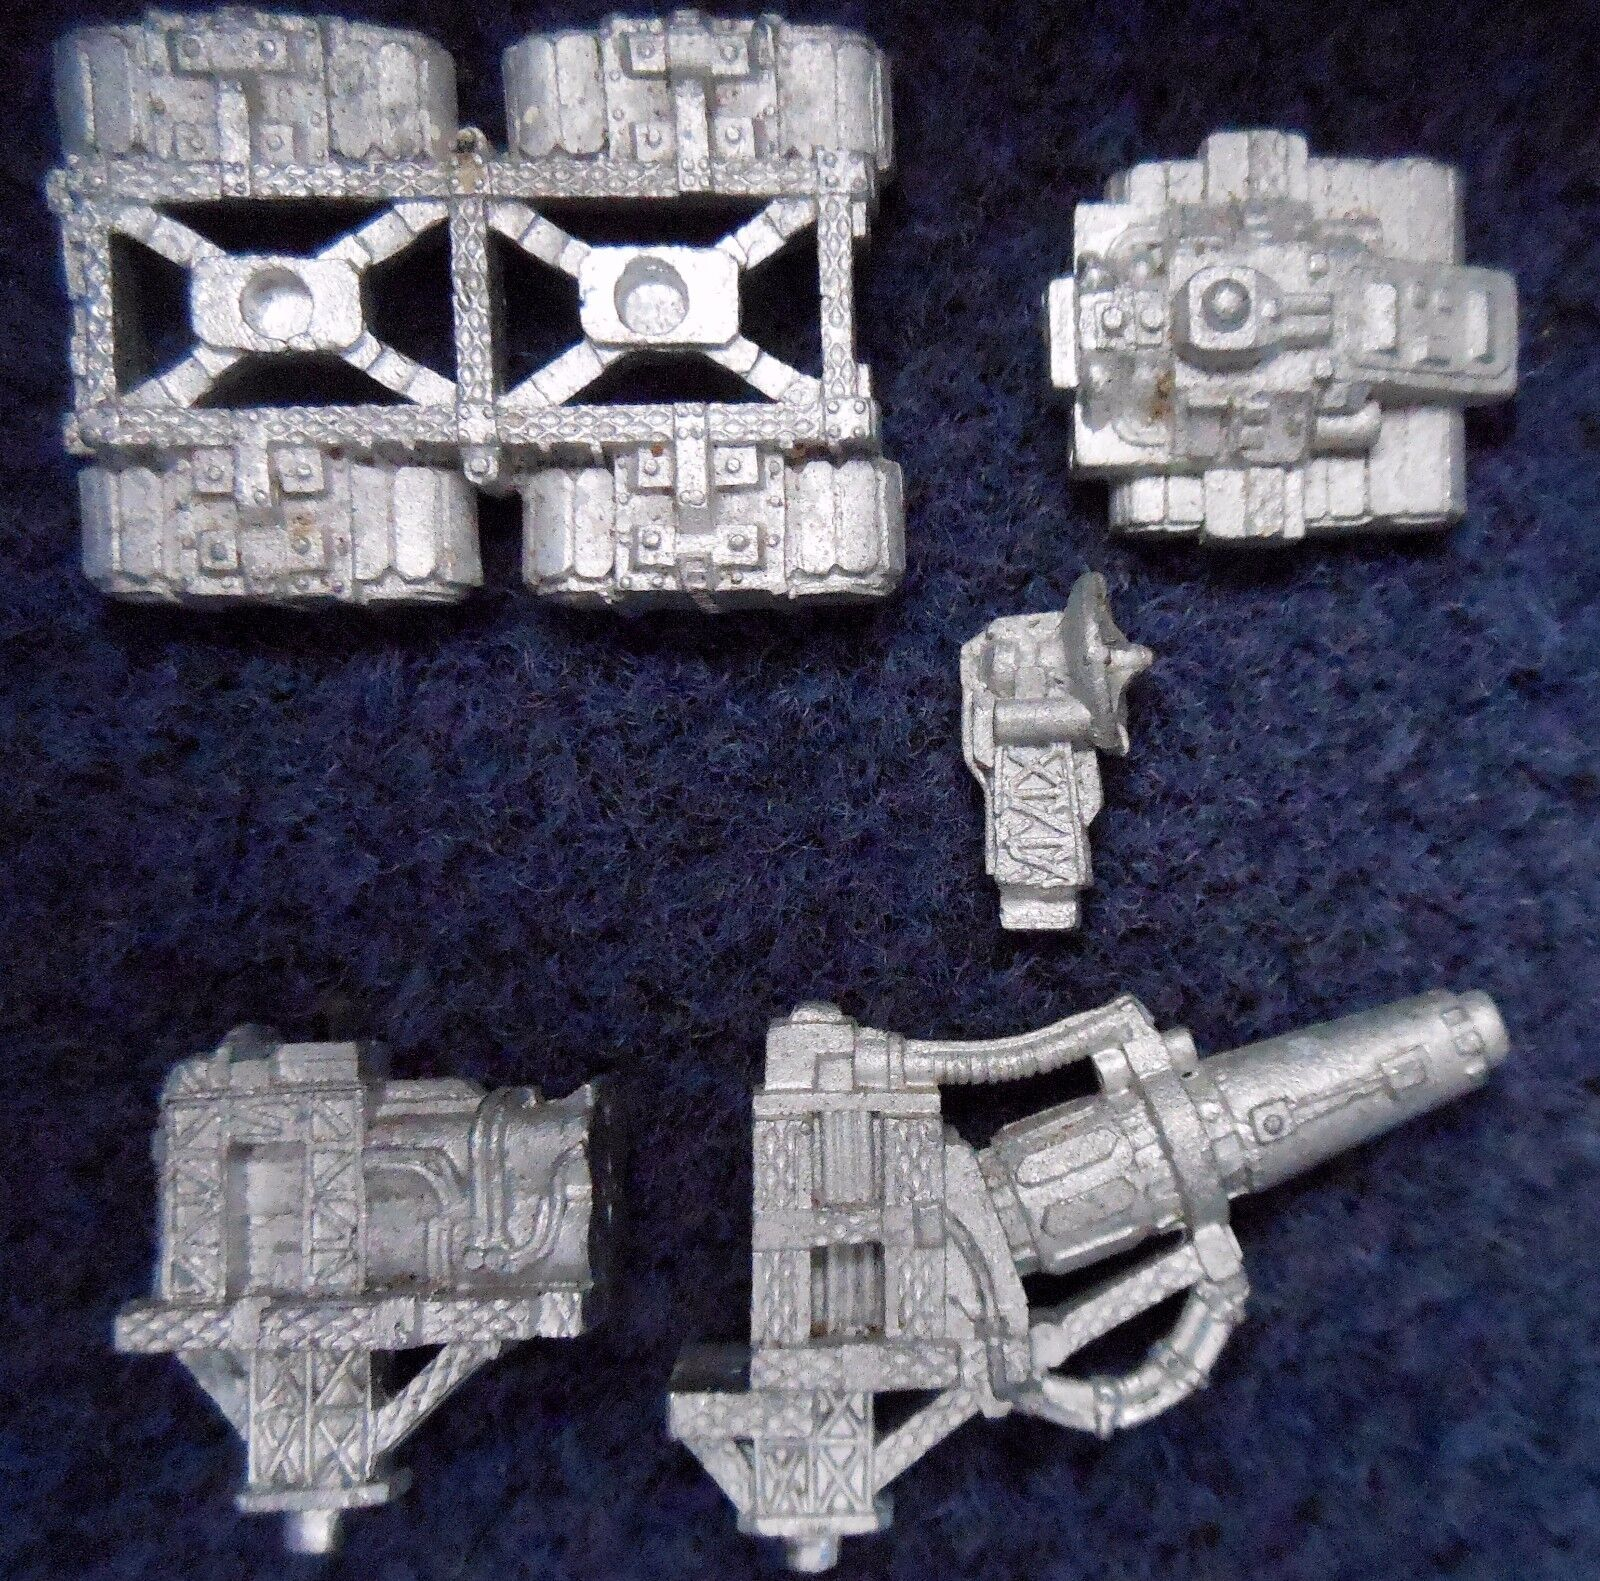 1995 Epic Imperial Guard Adeptus Mechanicus Ordinatus Armageddon Citadel Army